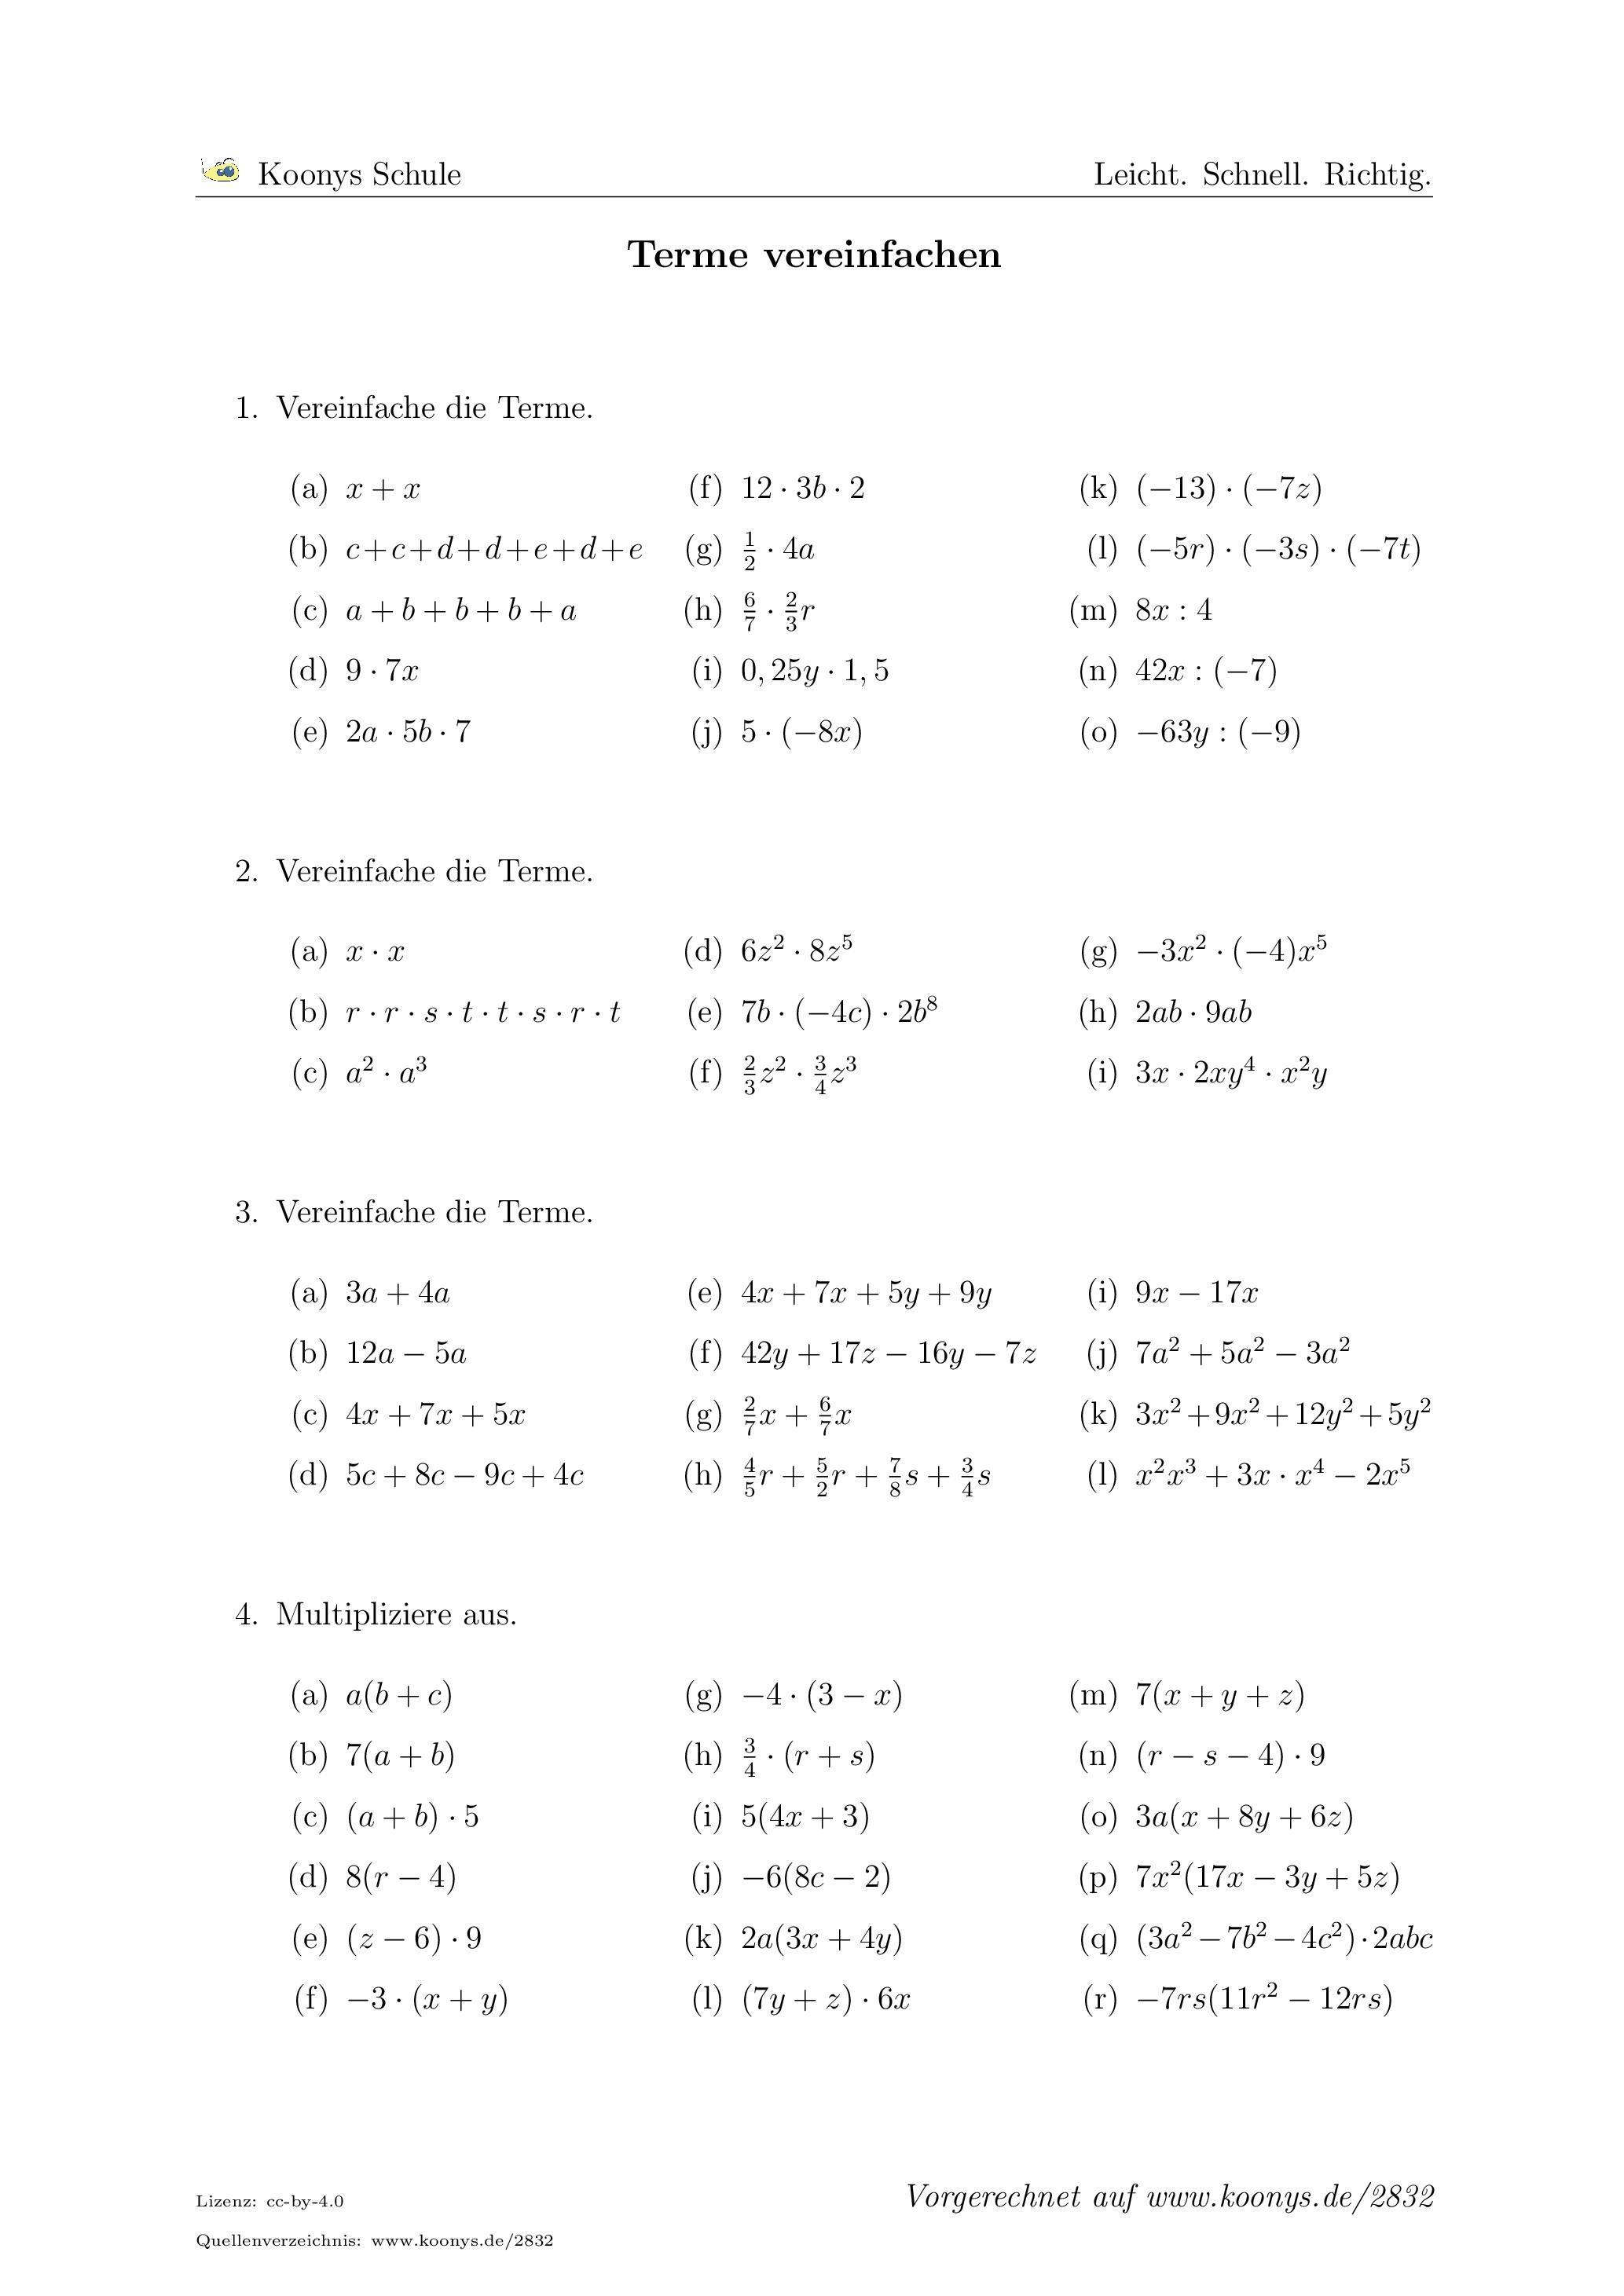 Terme vereinfachen | Arbeitsblatt #2832 | Schule | Pinterest ...